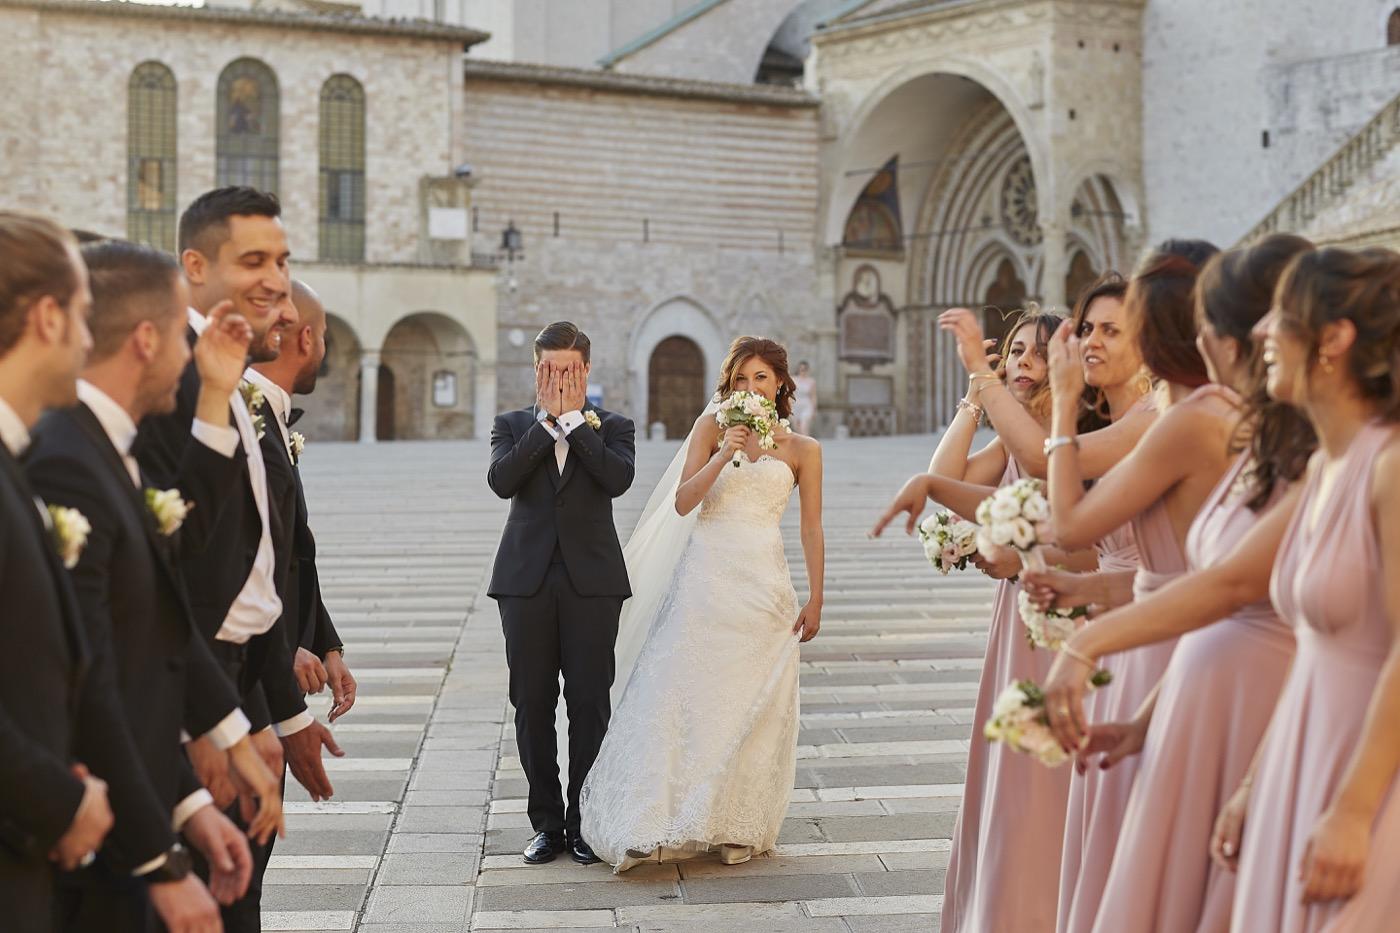 Claudio-Coppola-wedding-photographer-abbazia-7-frati-piegaro-75